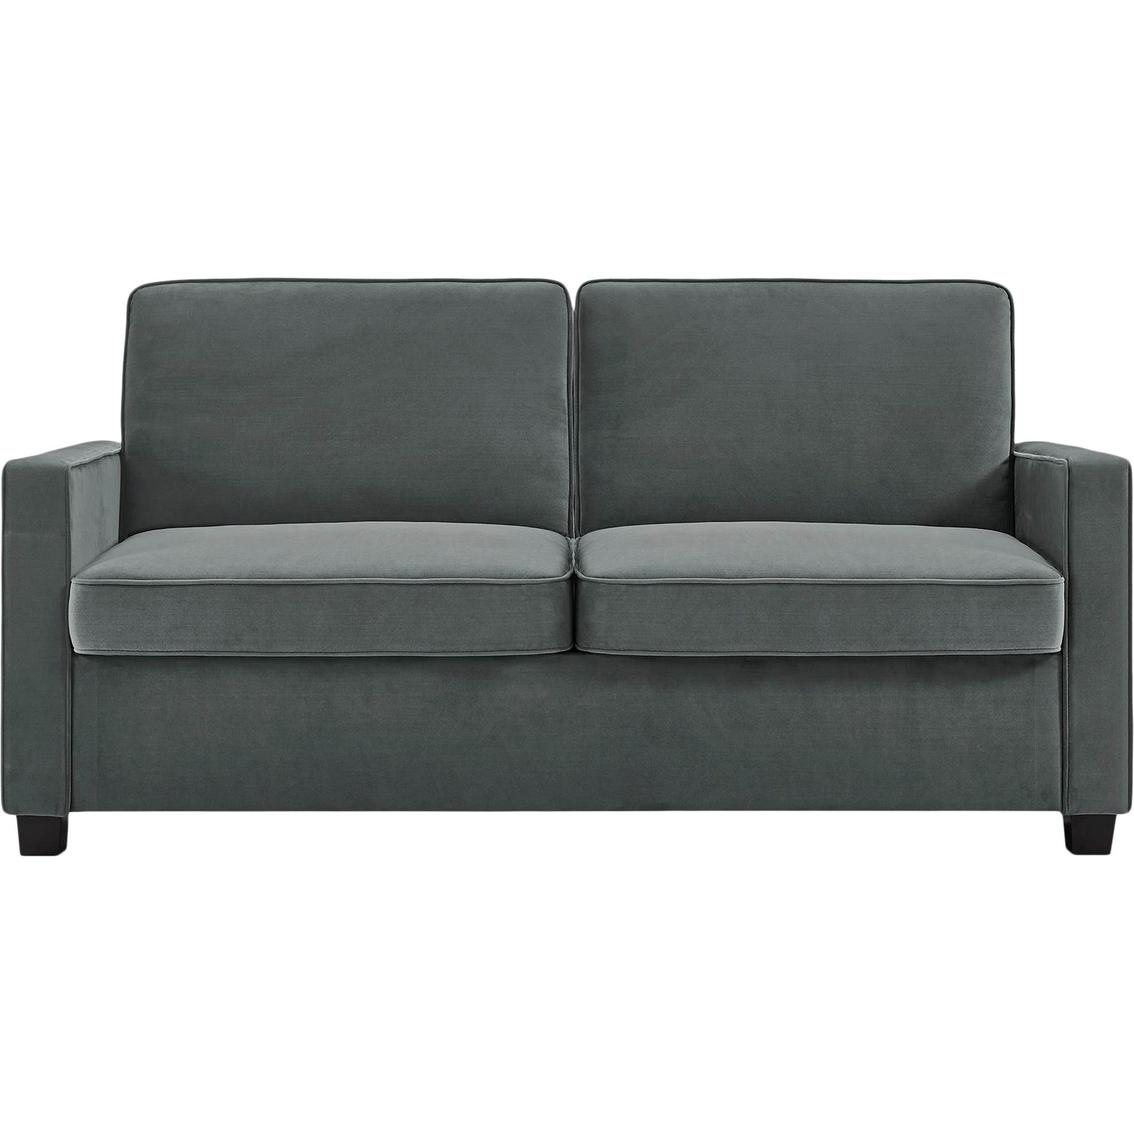 100% authentic 8cb74 c4553 Signature Sleep Casey Full Sleeper Sofa | Sofas & Couches ...